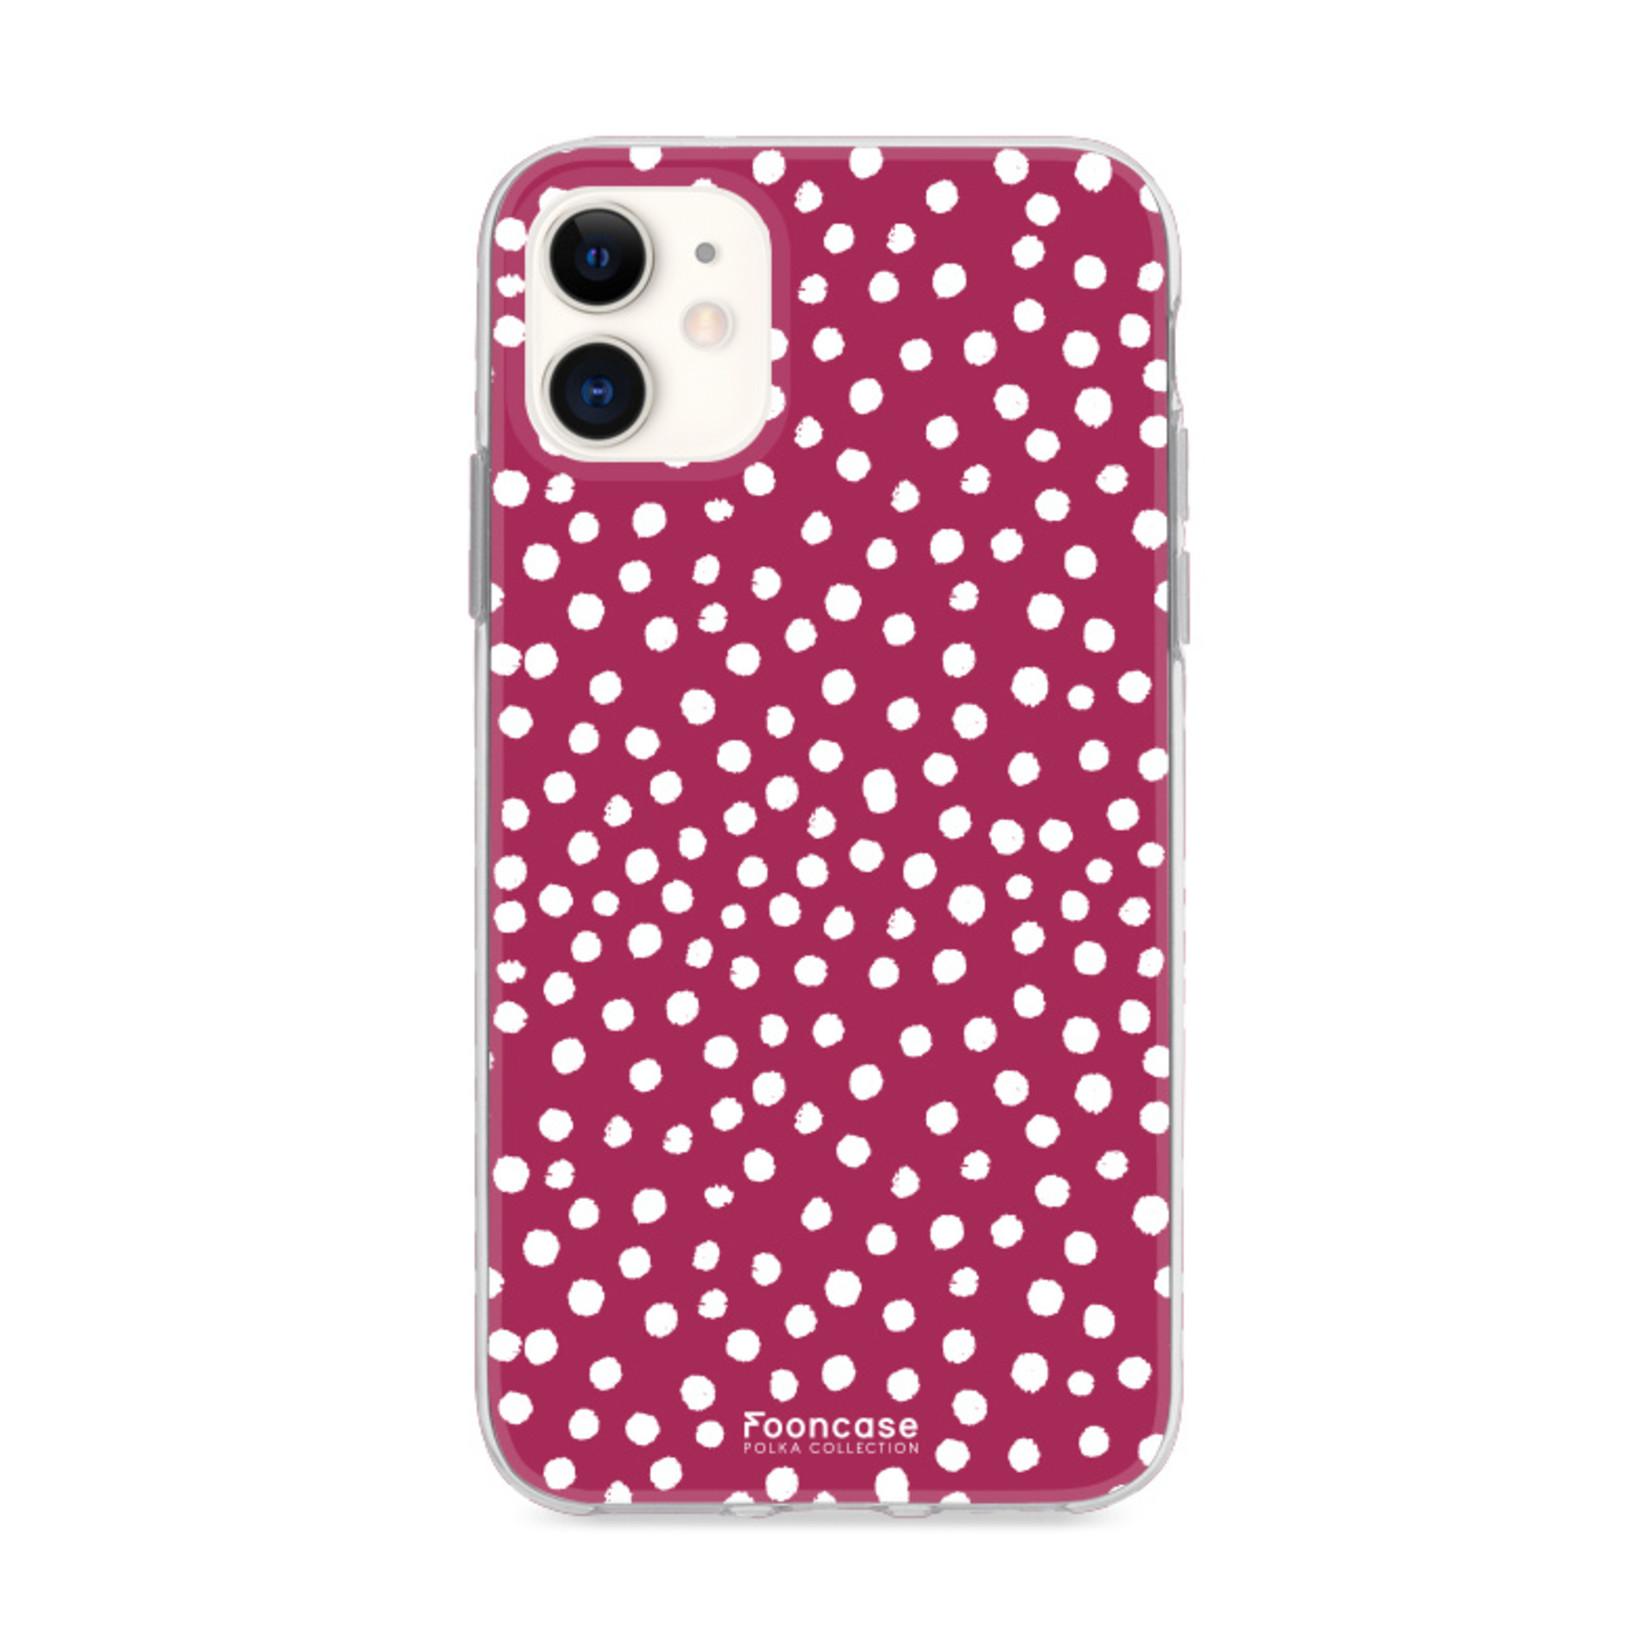 FOONCASE iPhone 12 hoesje TPU Soft Case - Back Cover - POLKA COLLECTION / Stipjes / Stippen / Bordeaux Rood